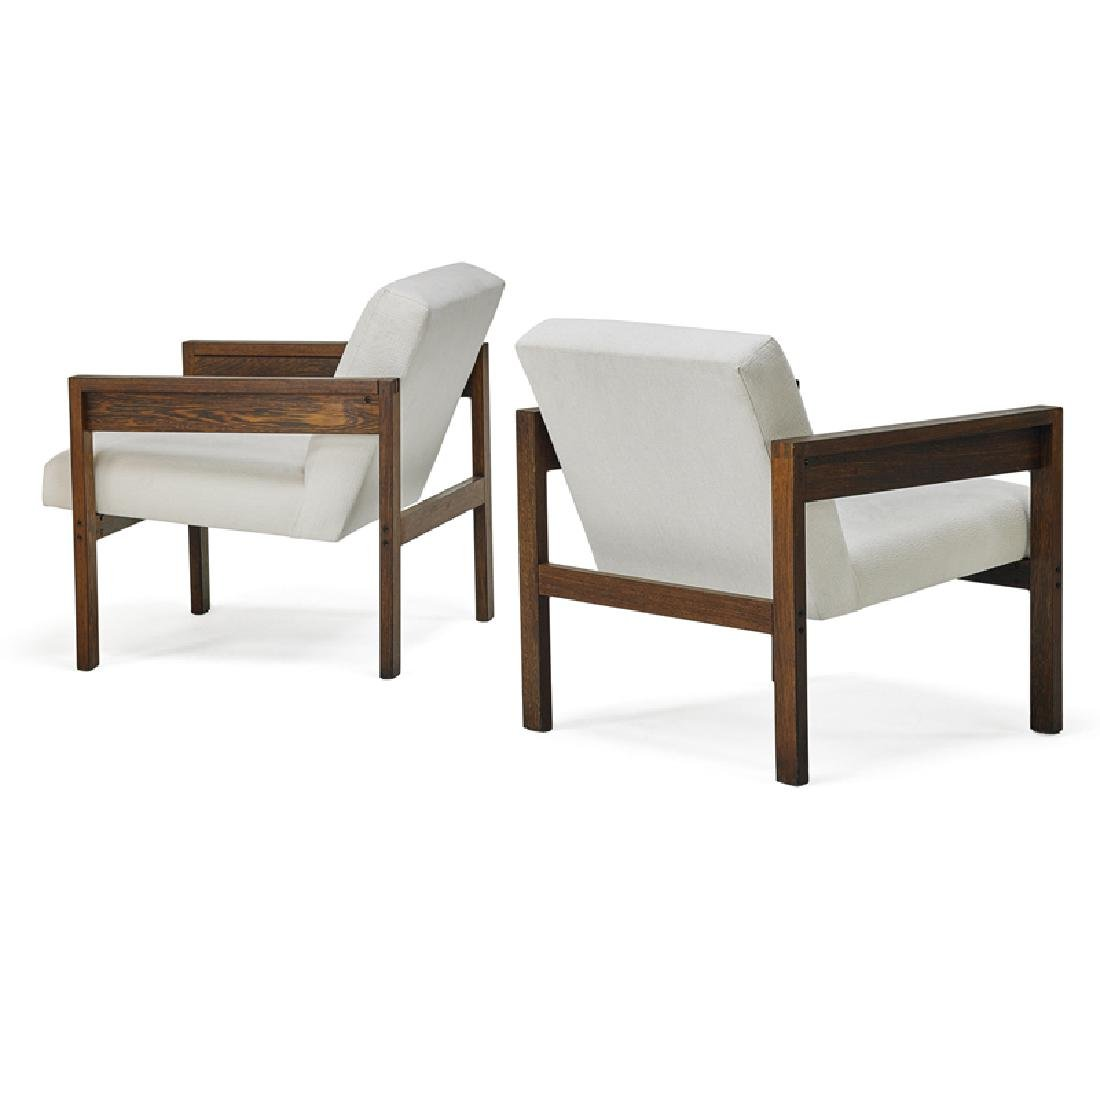 HEIN STOLLE; SPECTRUM Pair of armchairs - 2